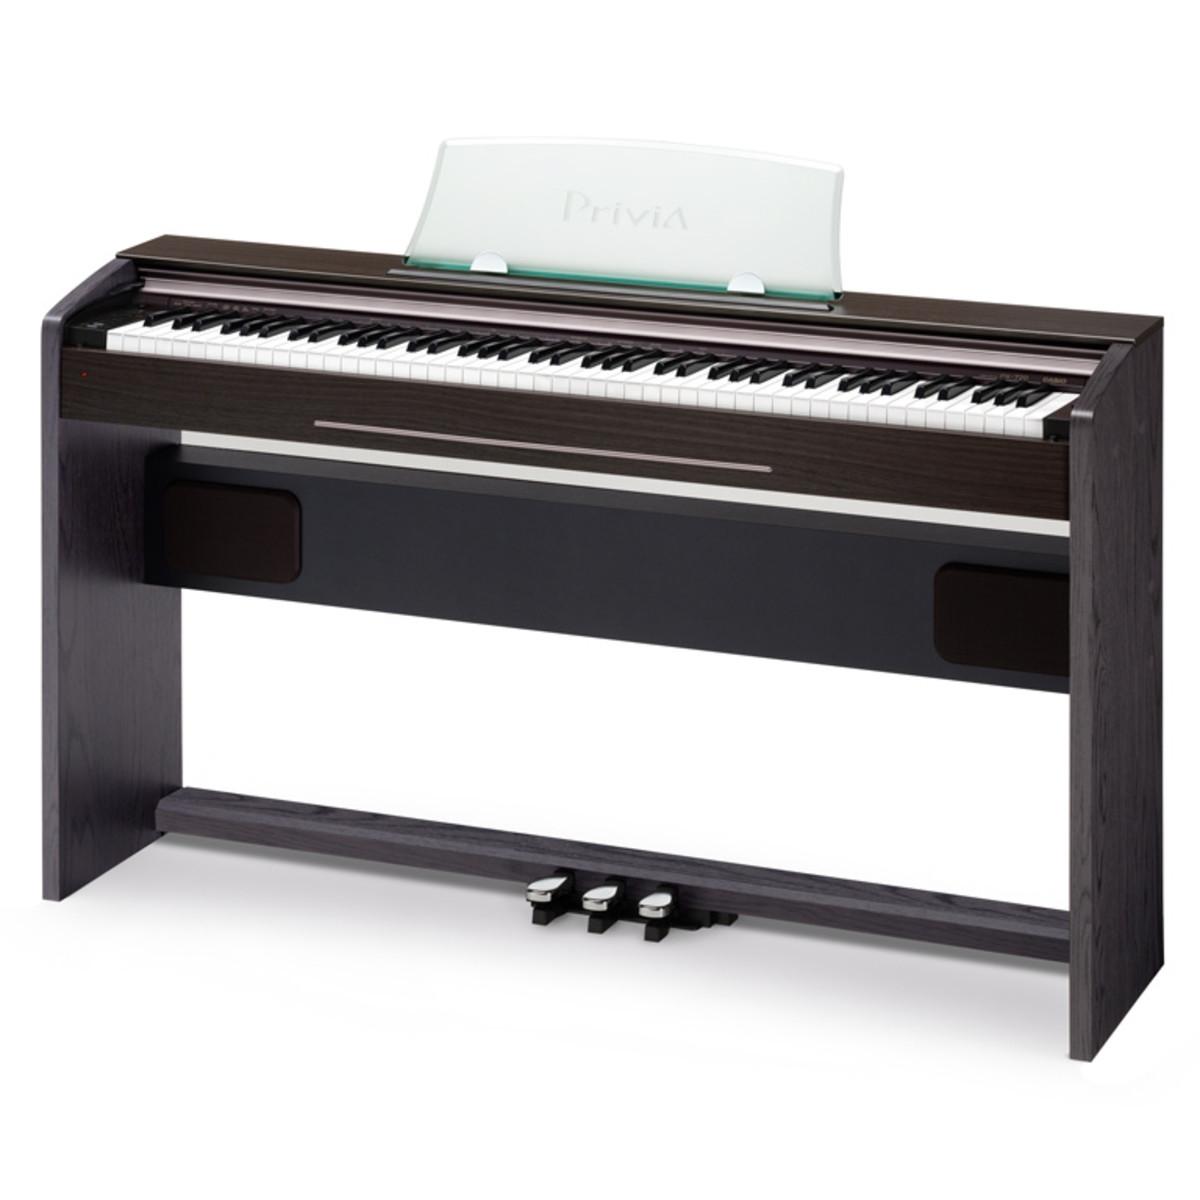 casio privia px 720 digital piano walnut at. Black Bedroom Furniture Sets. Home Design Ideas